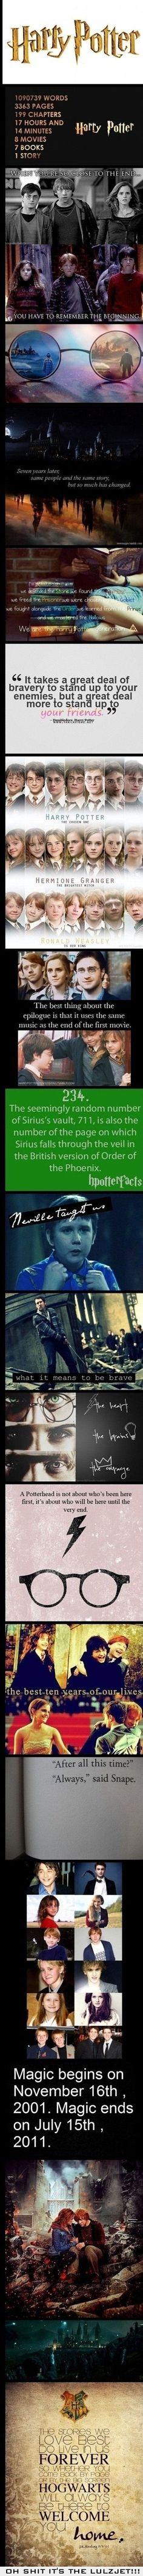 Harry Potter @carolynknaack